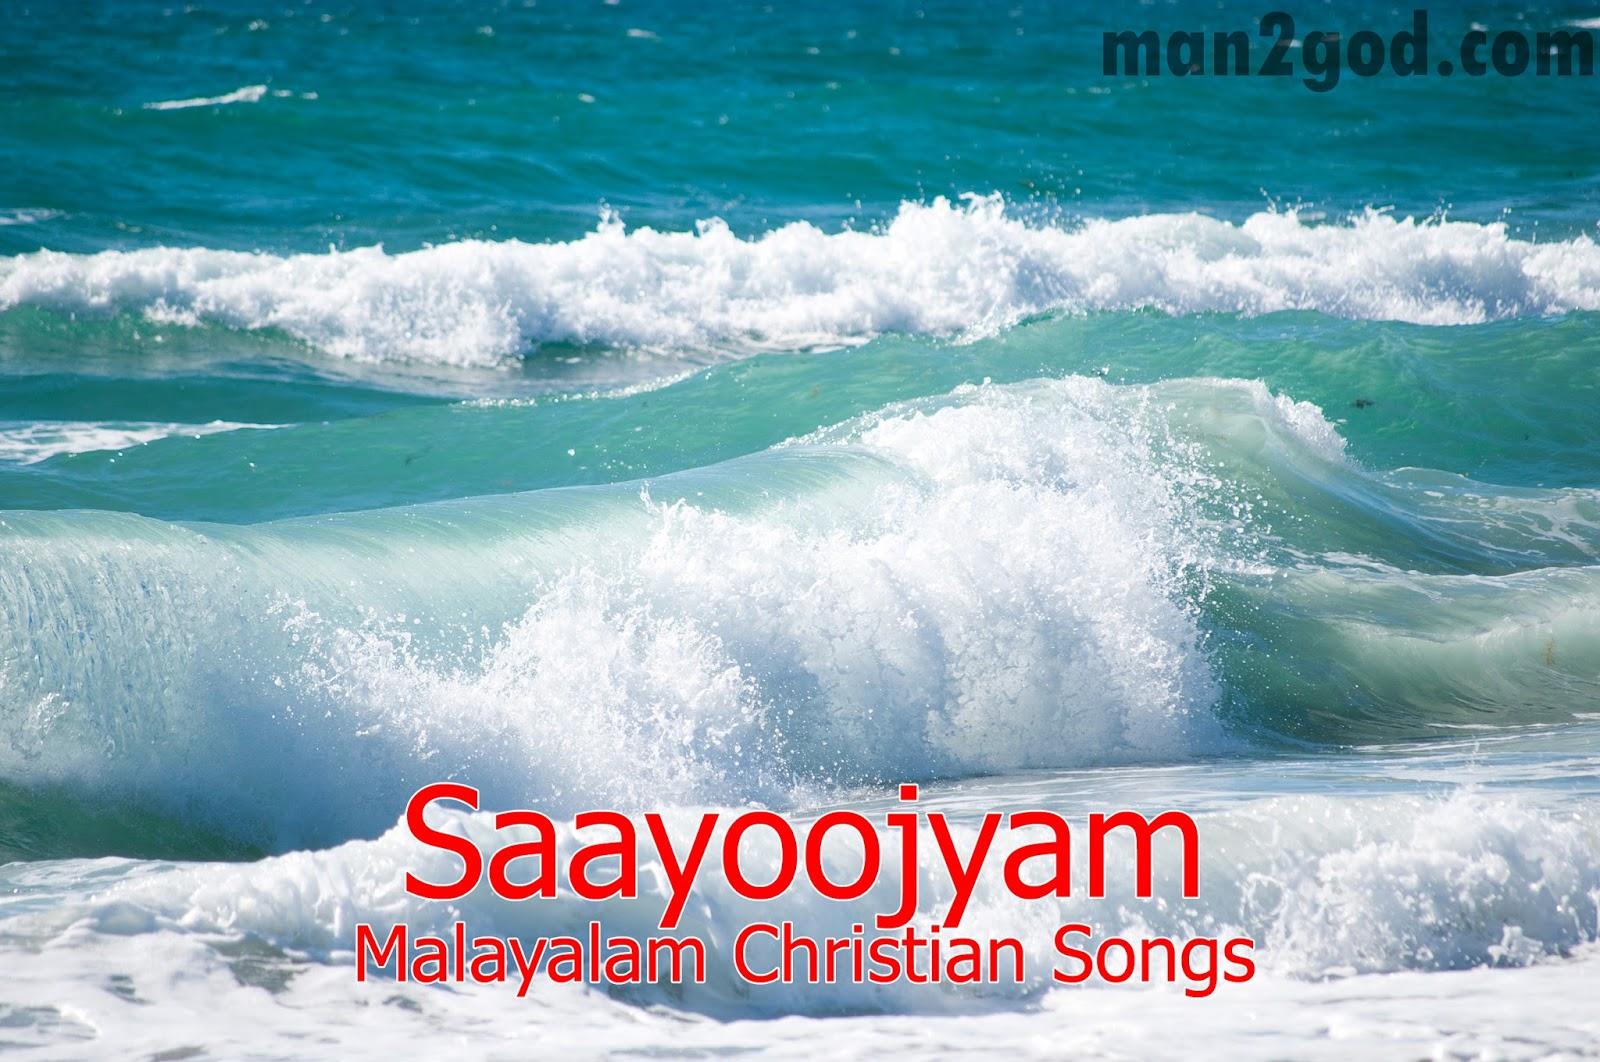 Saayoojyam Malayalam Christian Songs Free Download